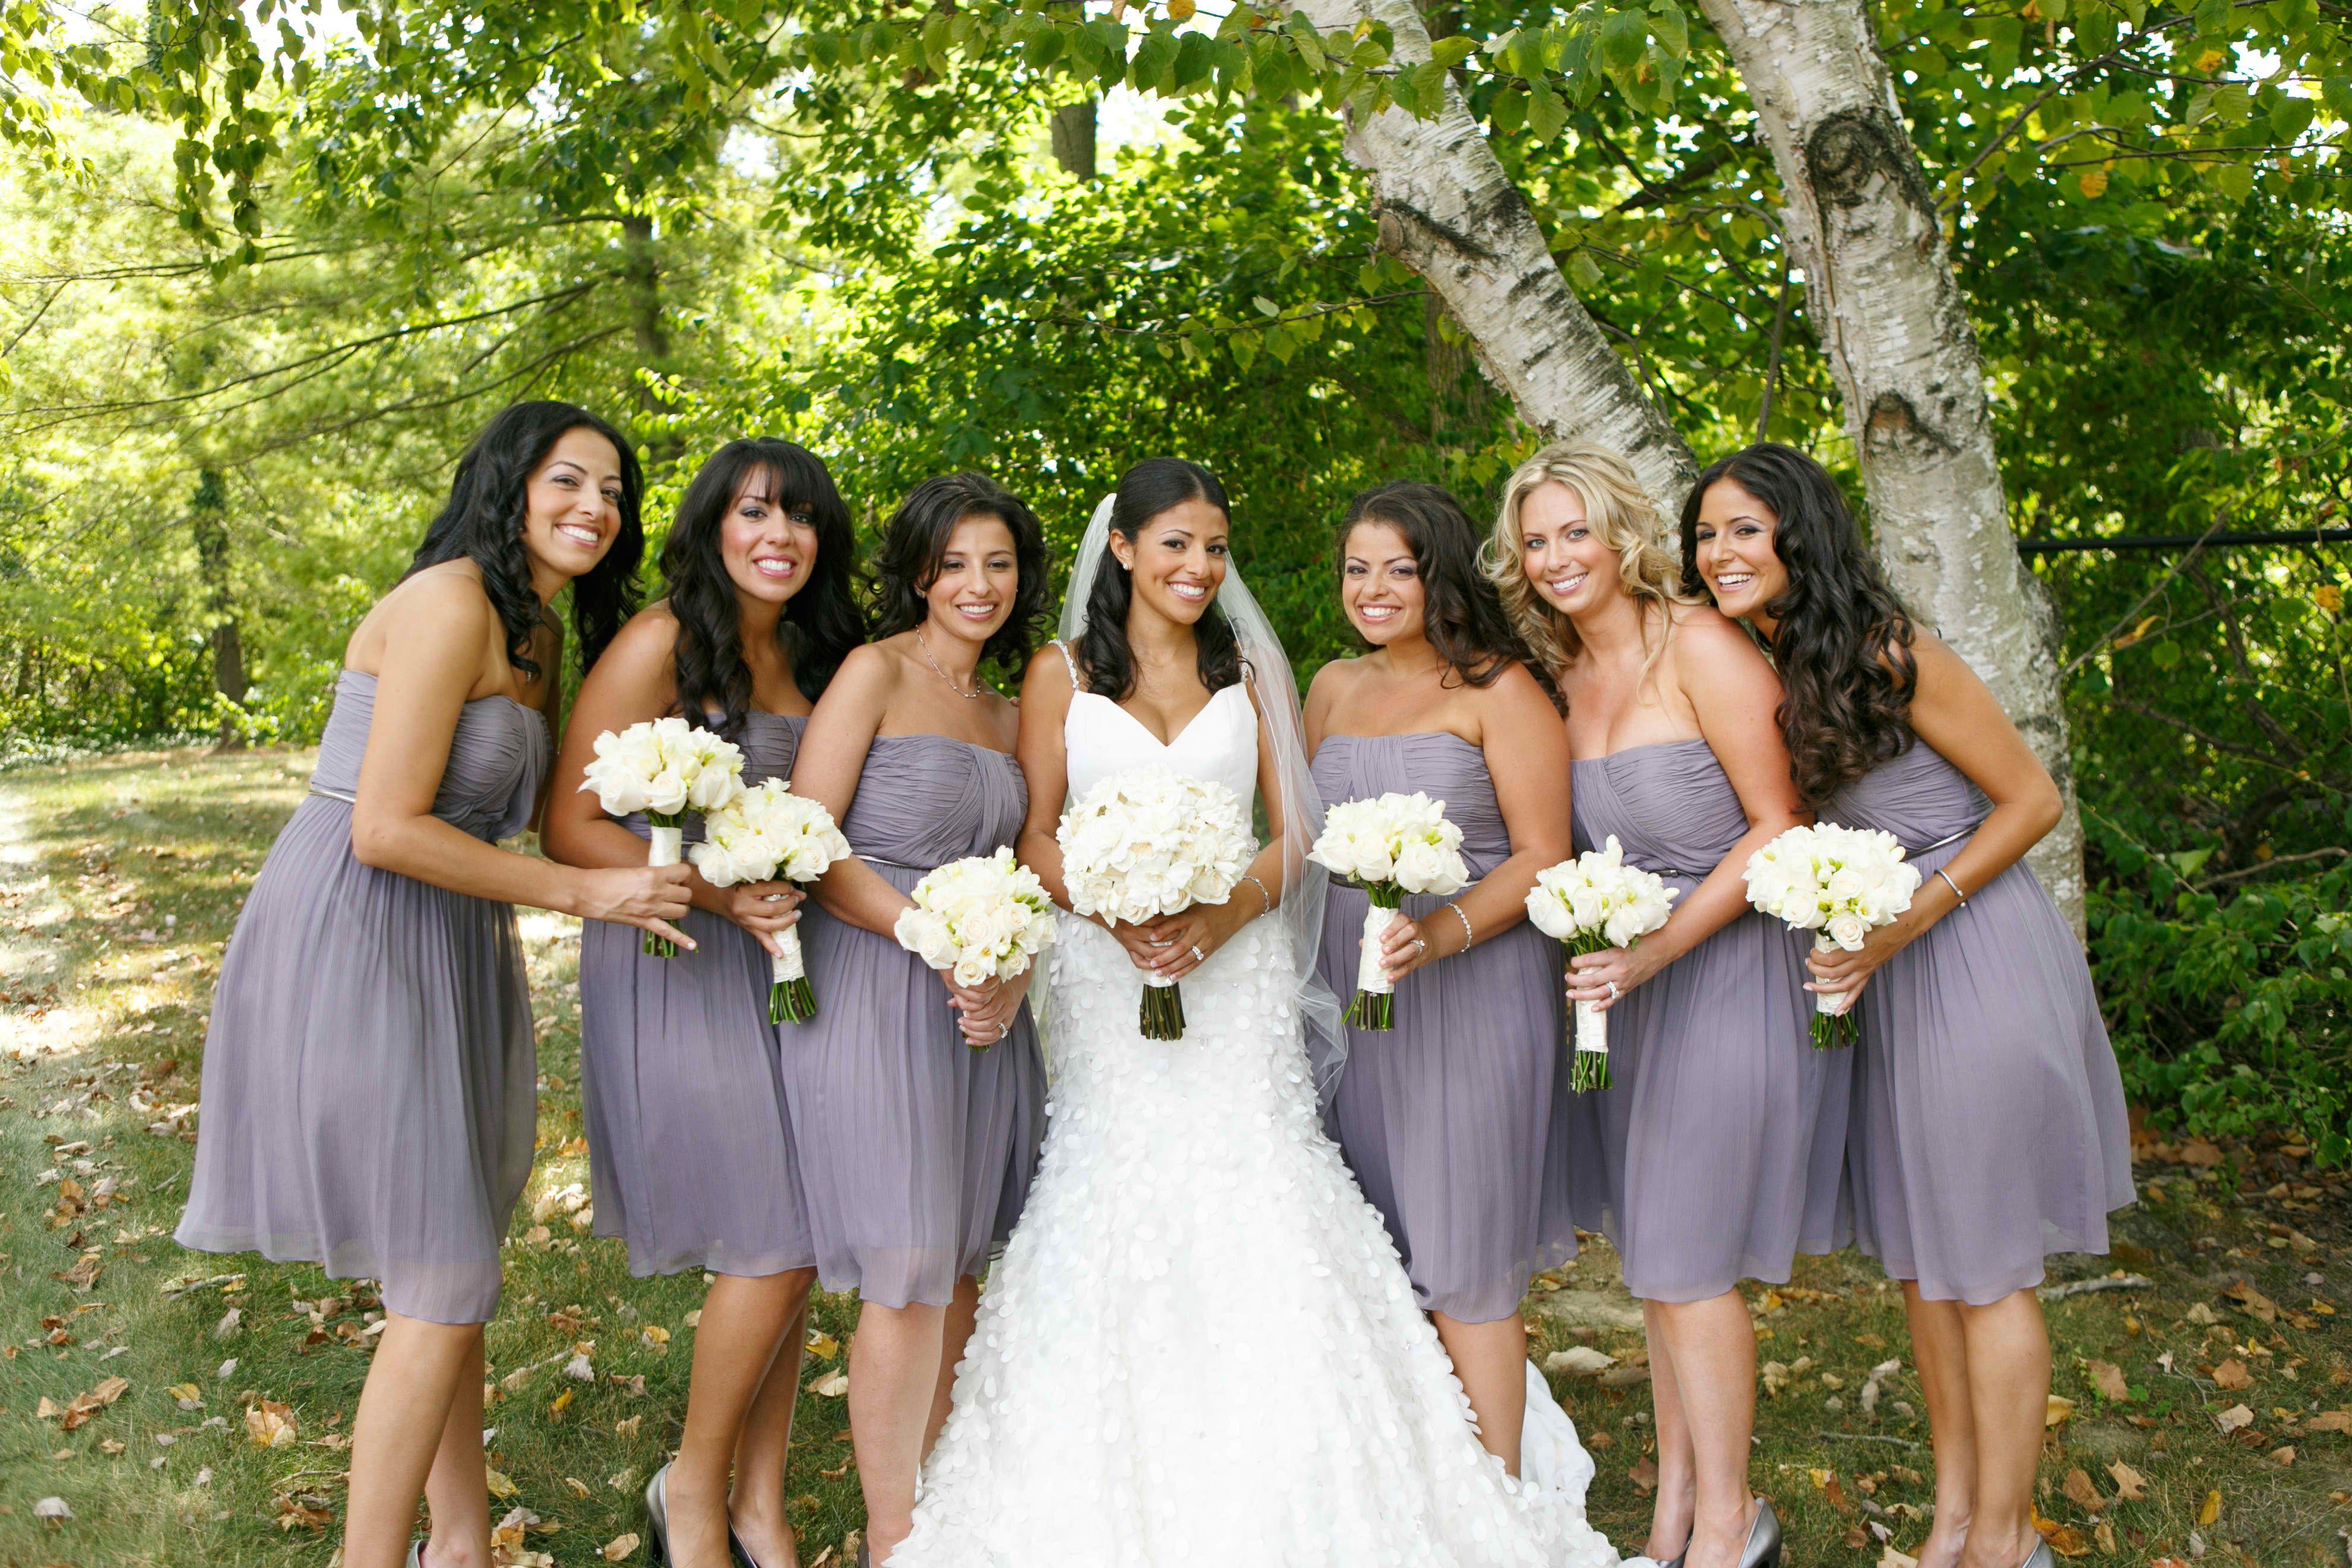 Lavender bridesmaid dresses google search wedding color theme lavender bridesmaid dresses google search ombrellifo Image collections